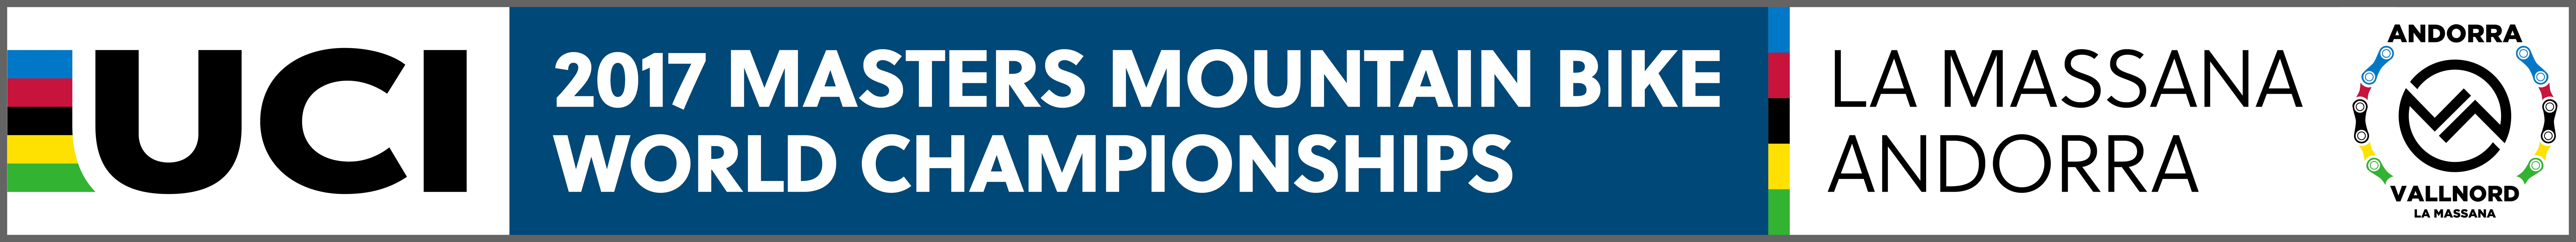 2017_UCI_MTB_Masters_WCh_Andorra_La-Massana_RGB_Keyline